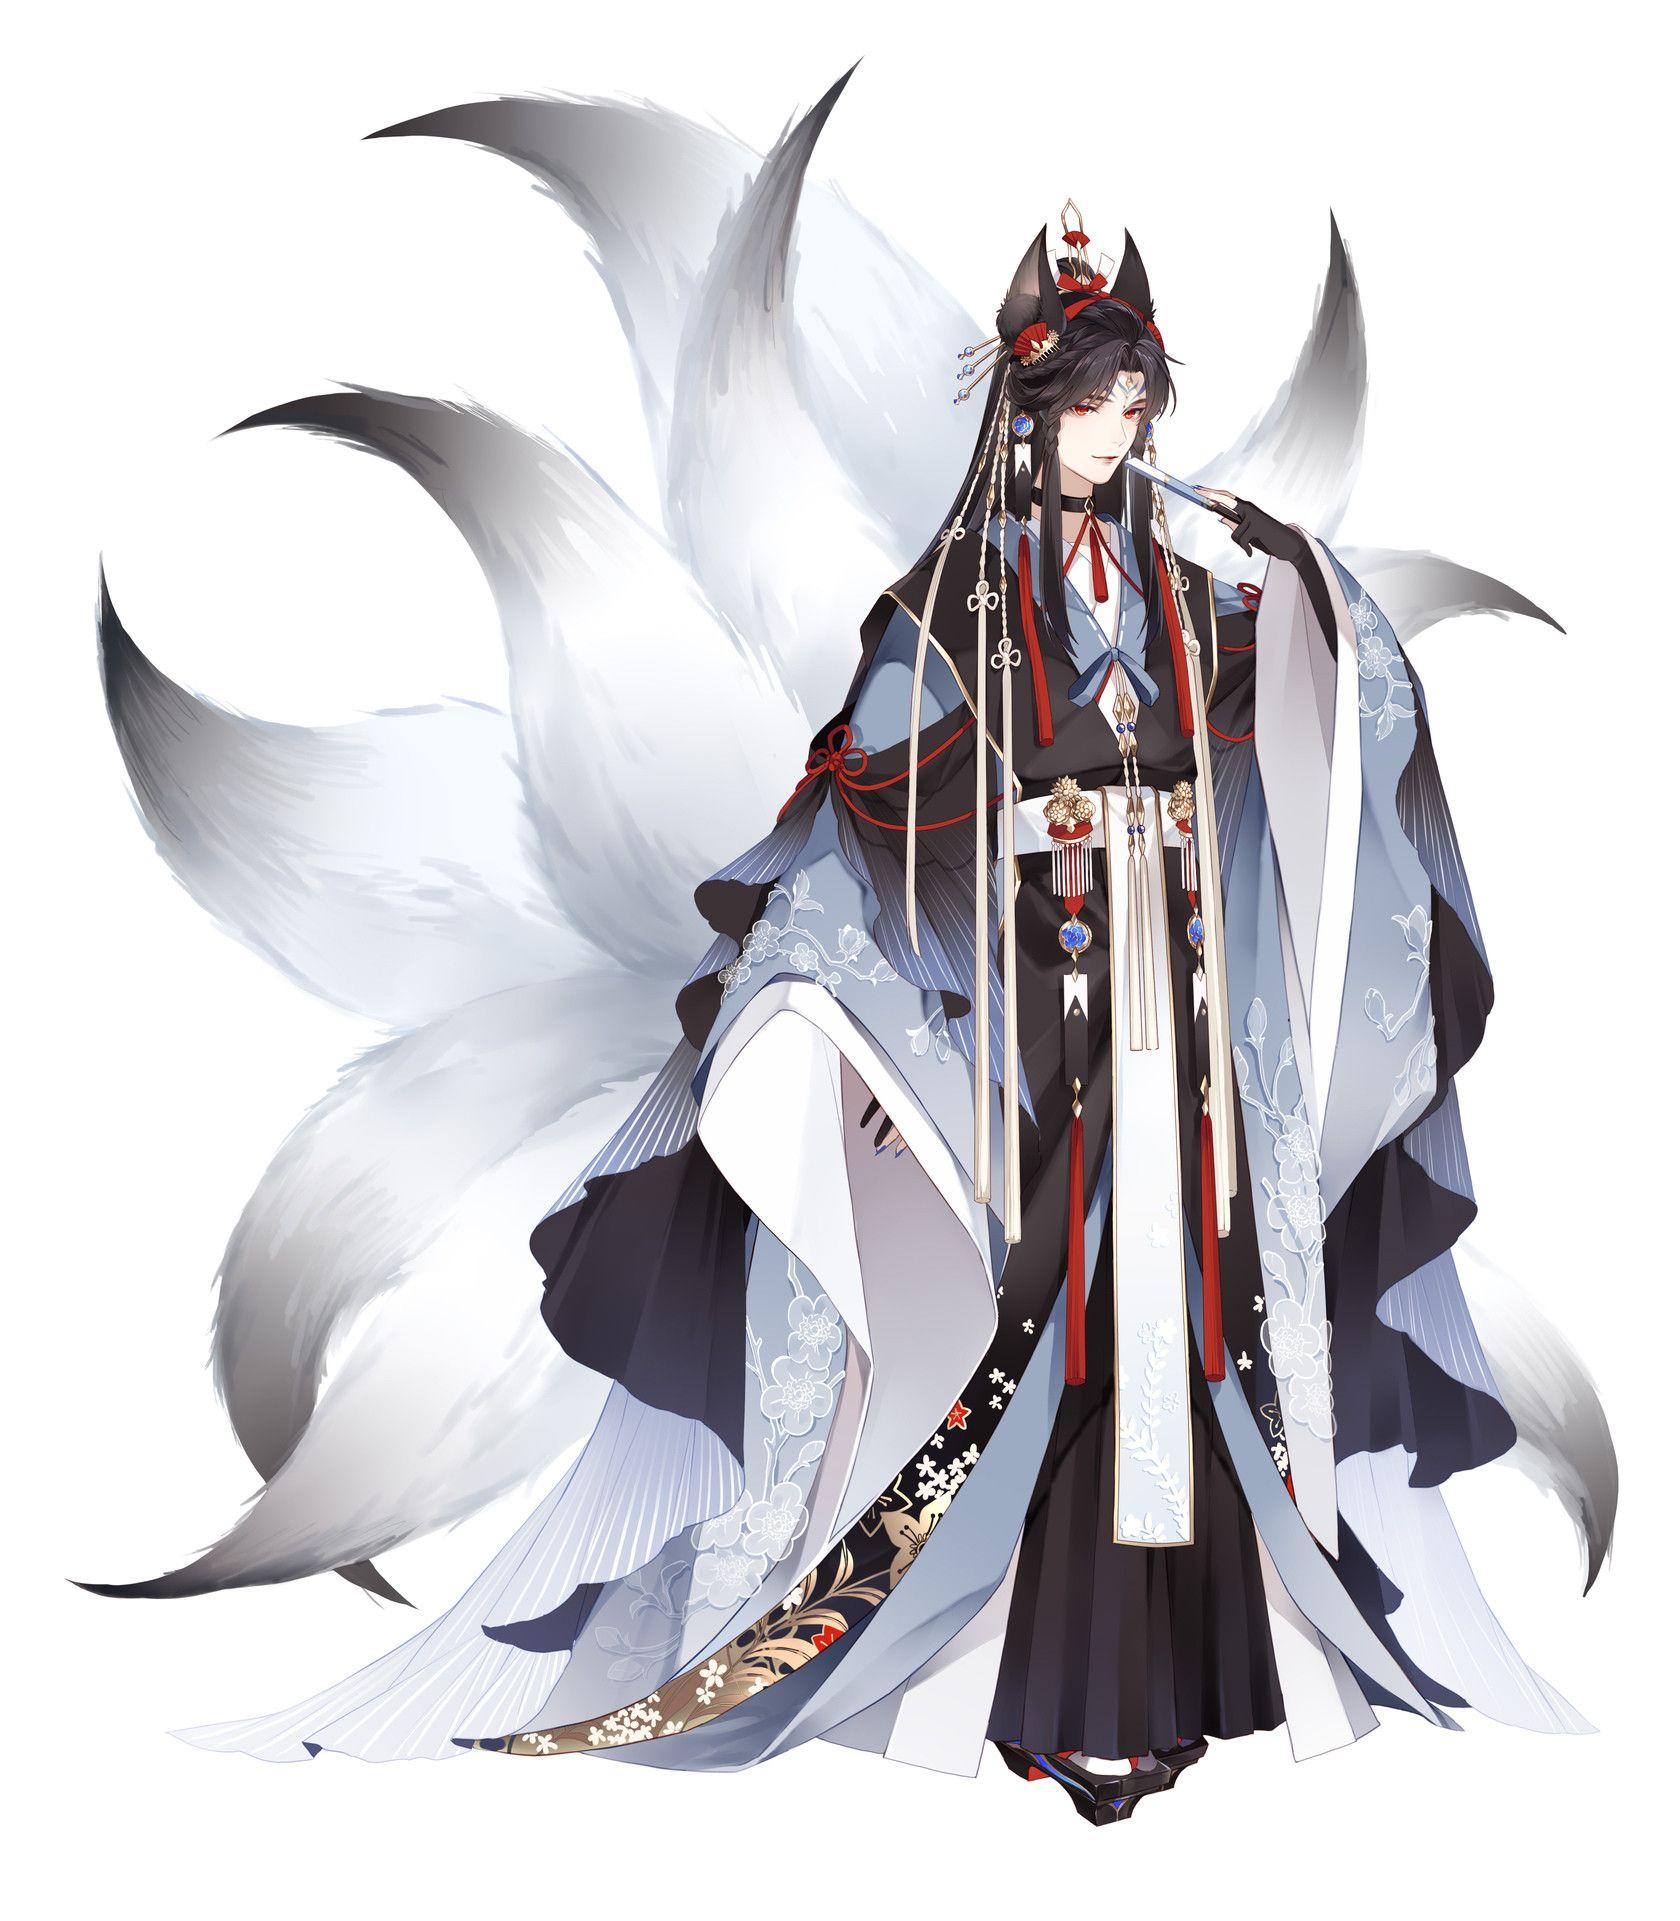 pin by ibti djafar on artist 一锅玄哥 in 2020 anime kimono handsome anime anime demon boy